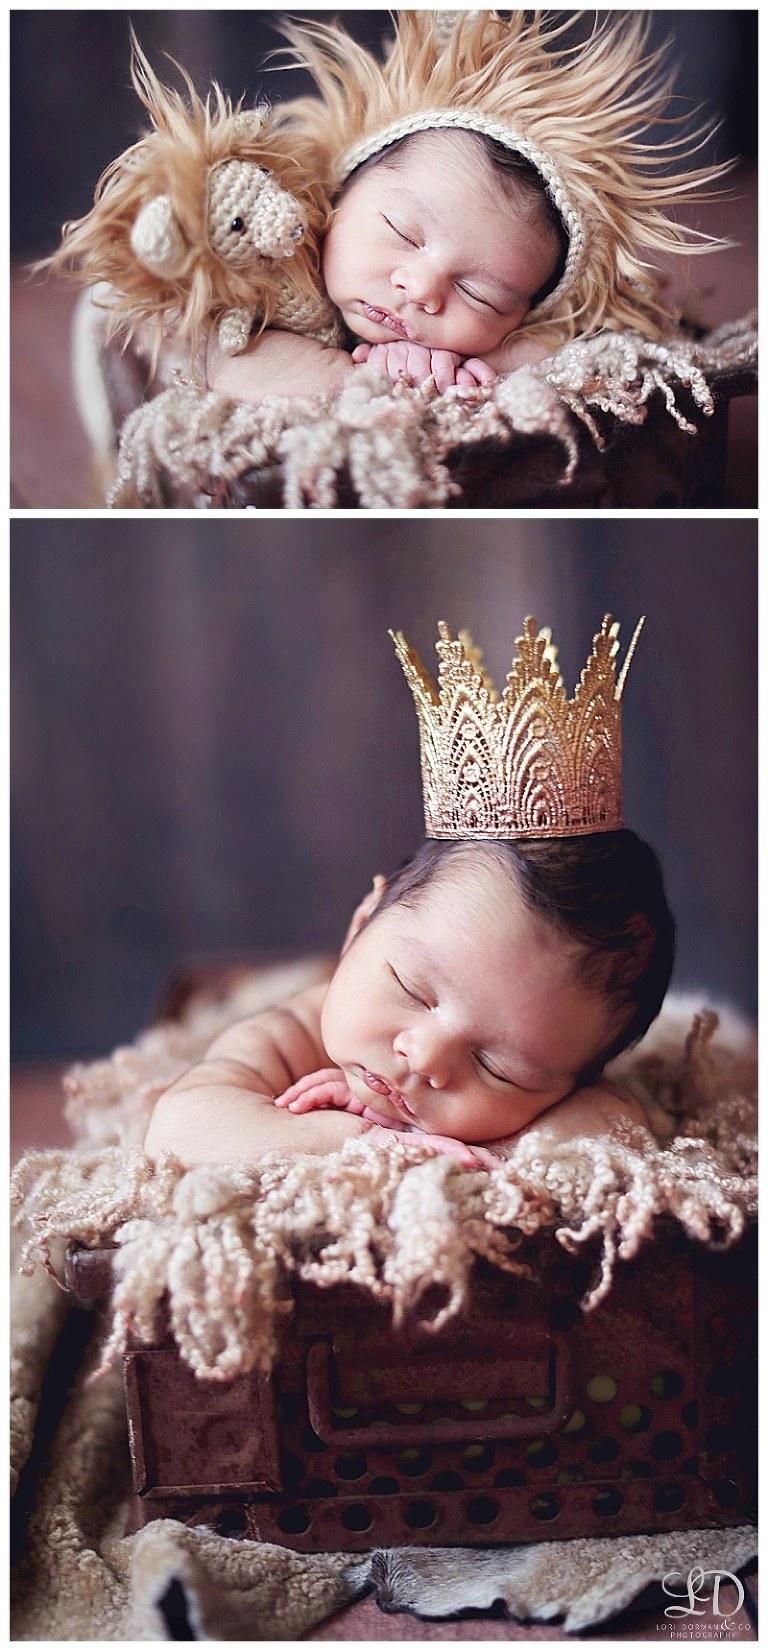 sweet maternity photoshoot-lori dorman photography-maternity boudoir-professional photographer_5335.jpg